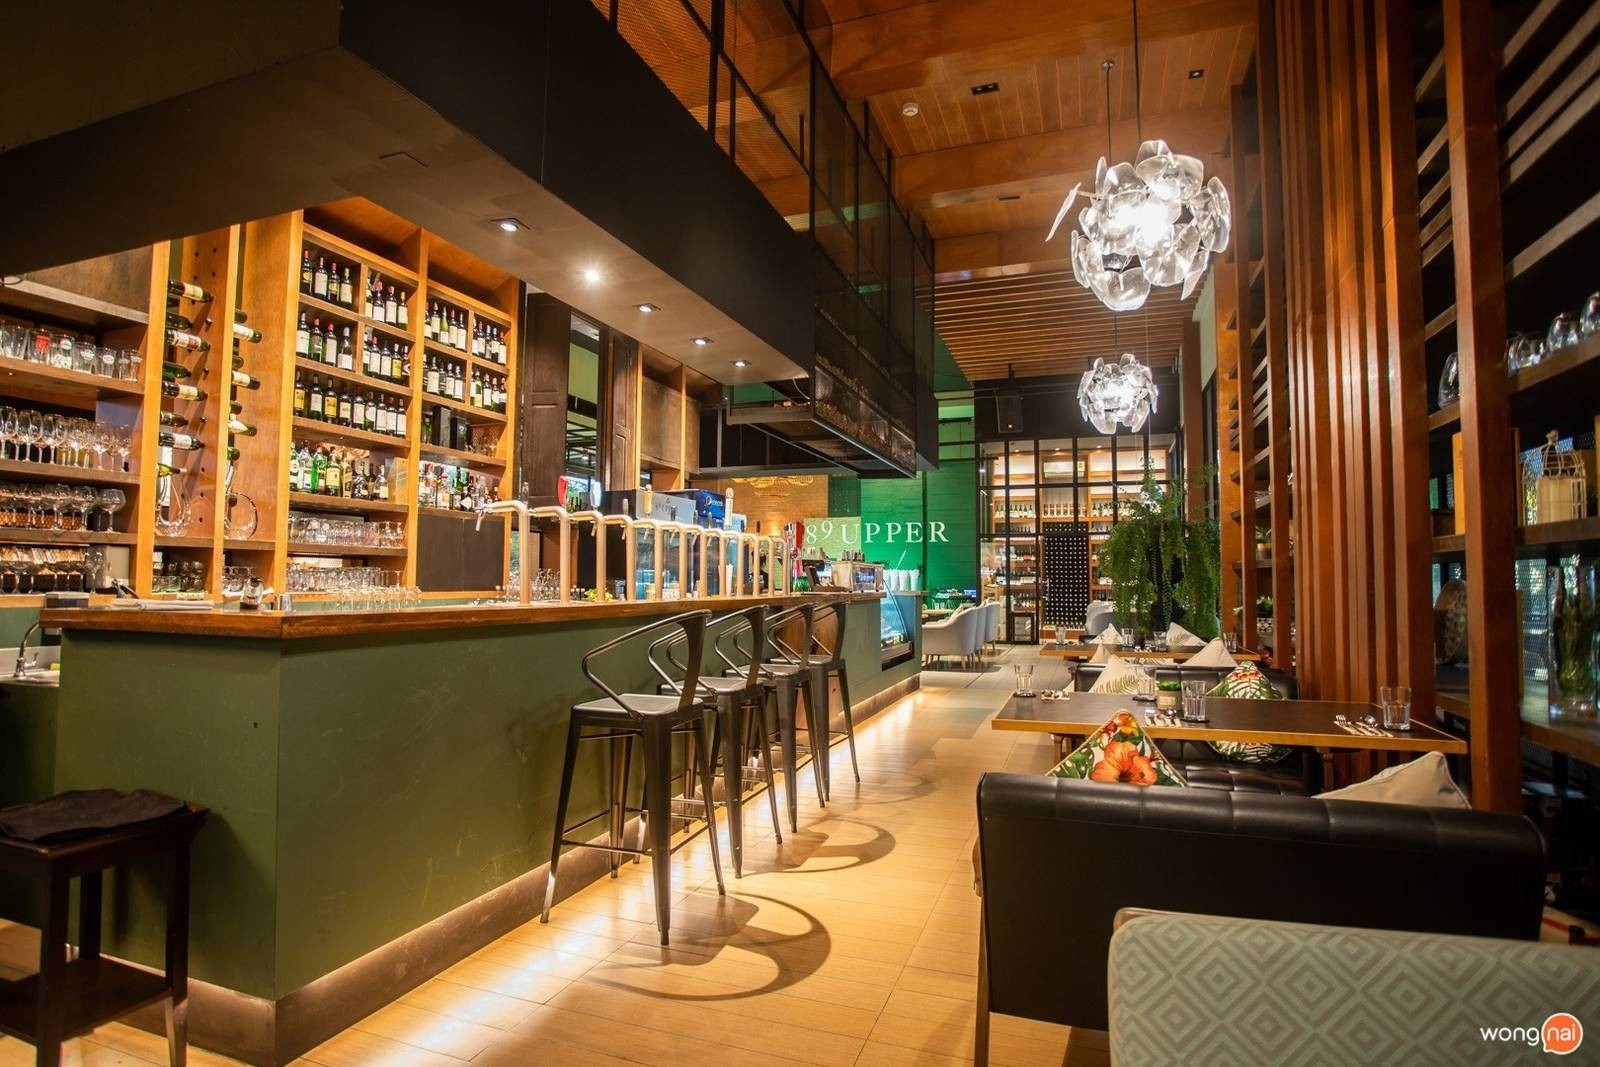 89 Upper Bar & Restaurant UD TOWN